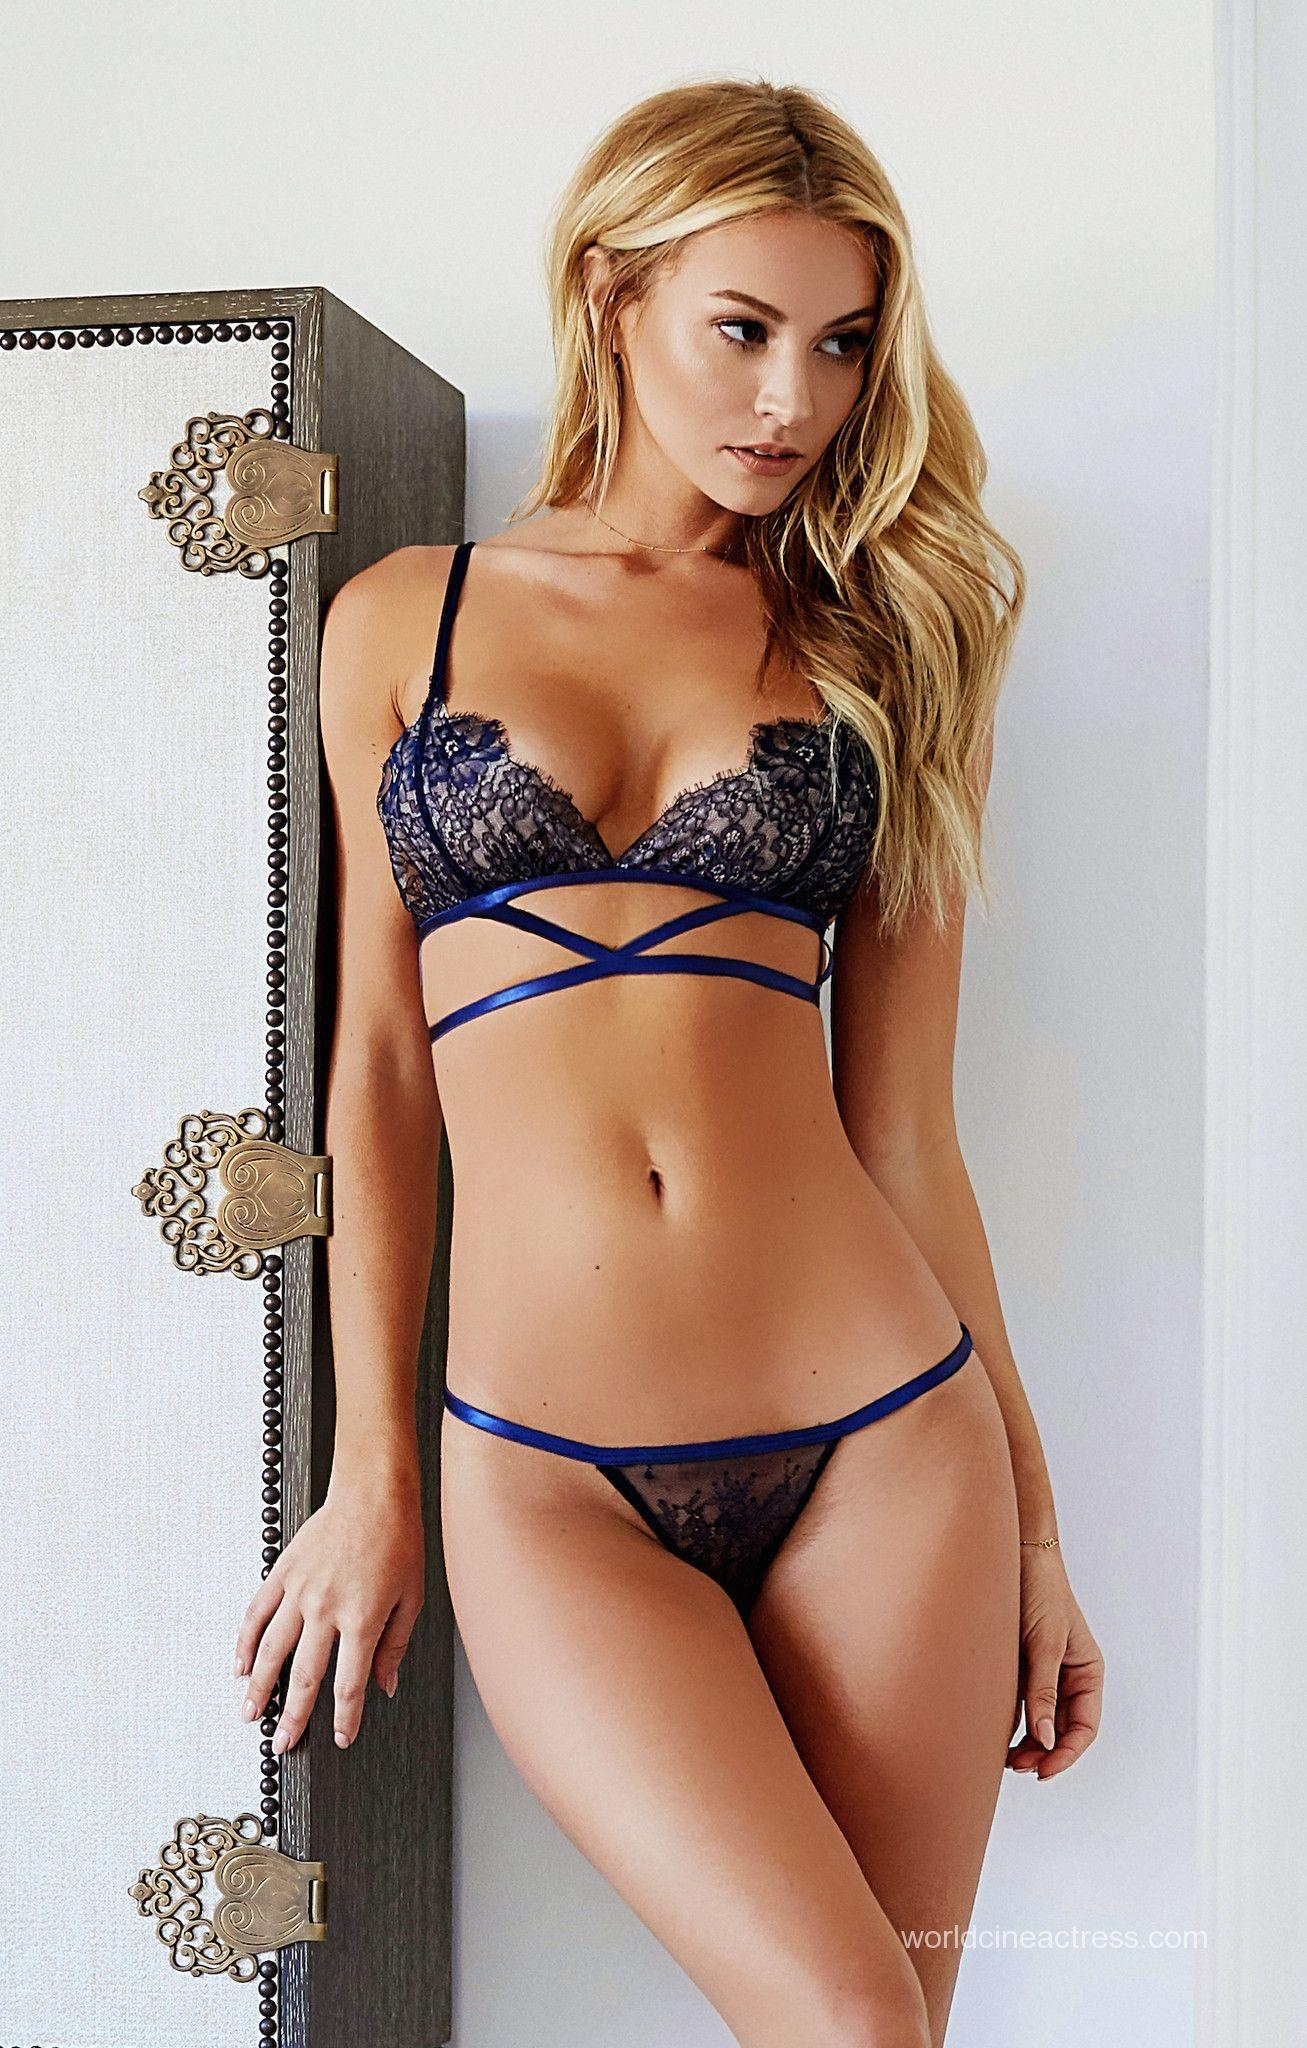 Italian Hotties Minimalist bryana holly sexiest stock photo gallery | world cine actress